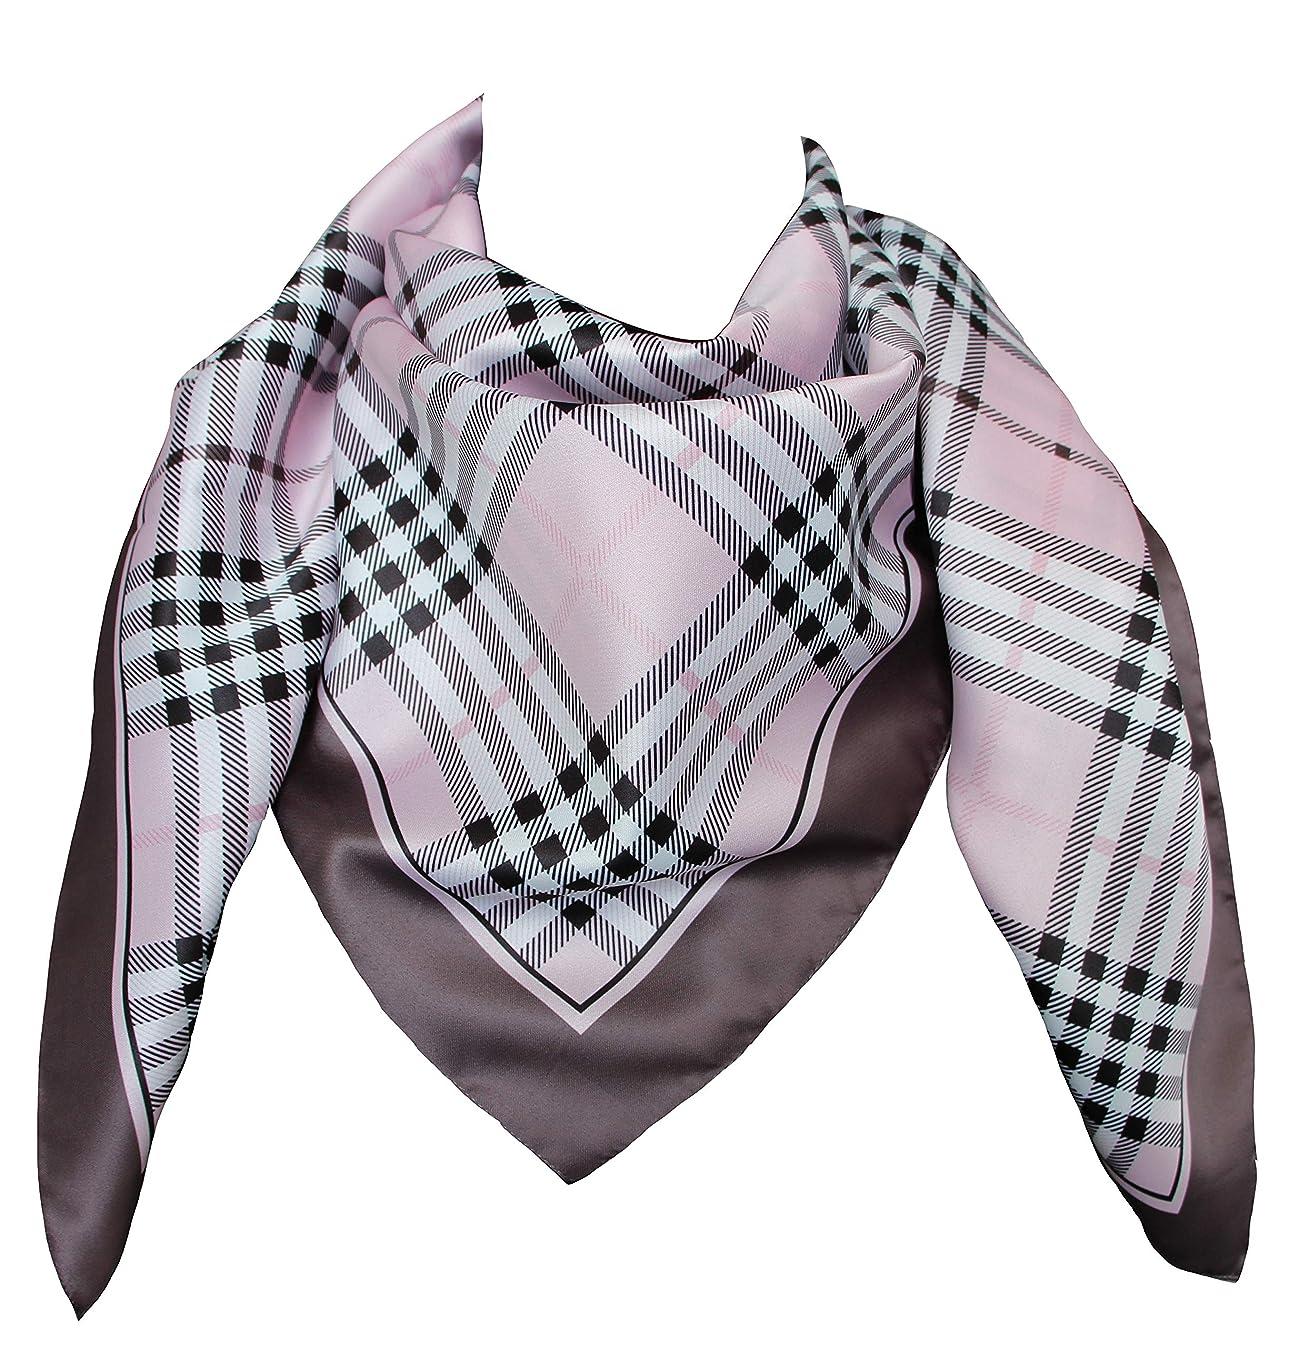 foulard dis 62689 var 3 size inch 36 x 36